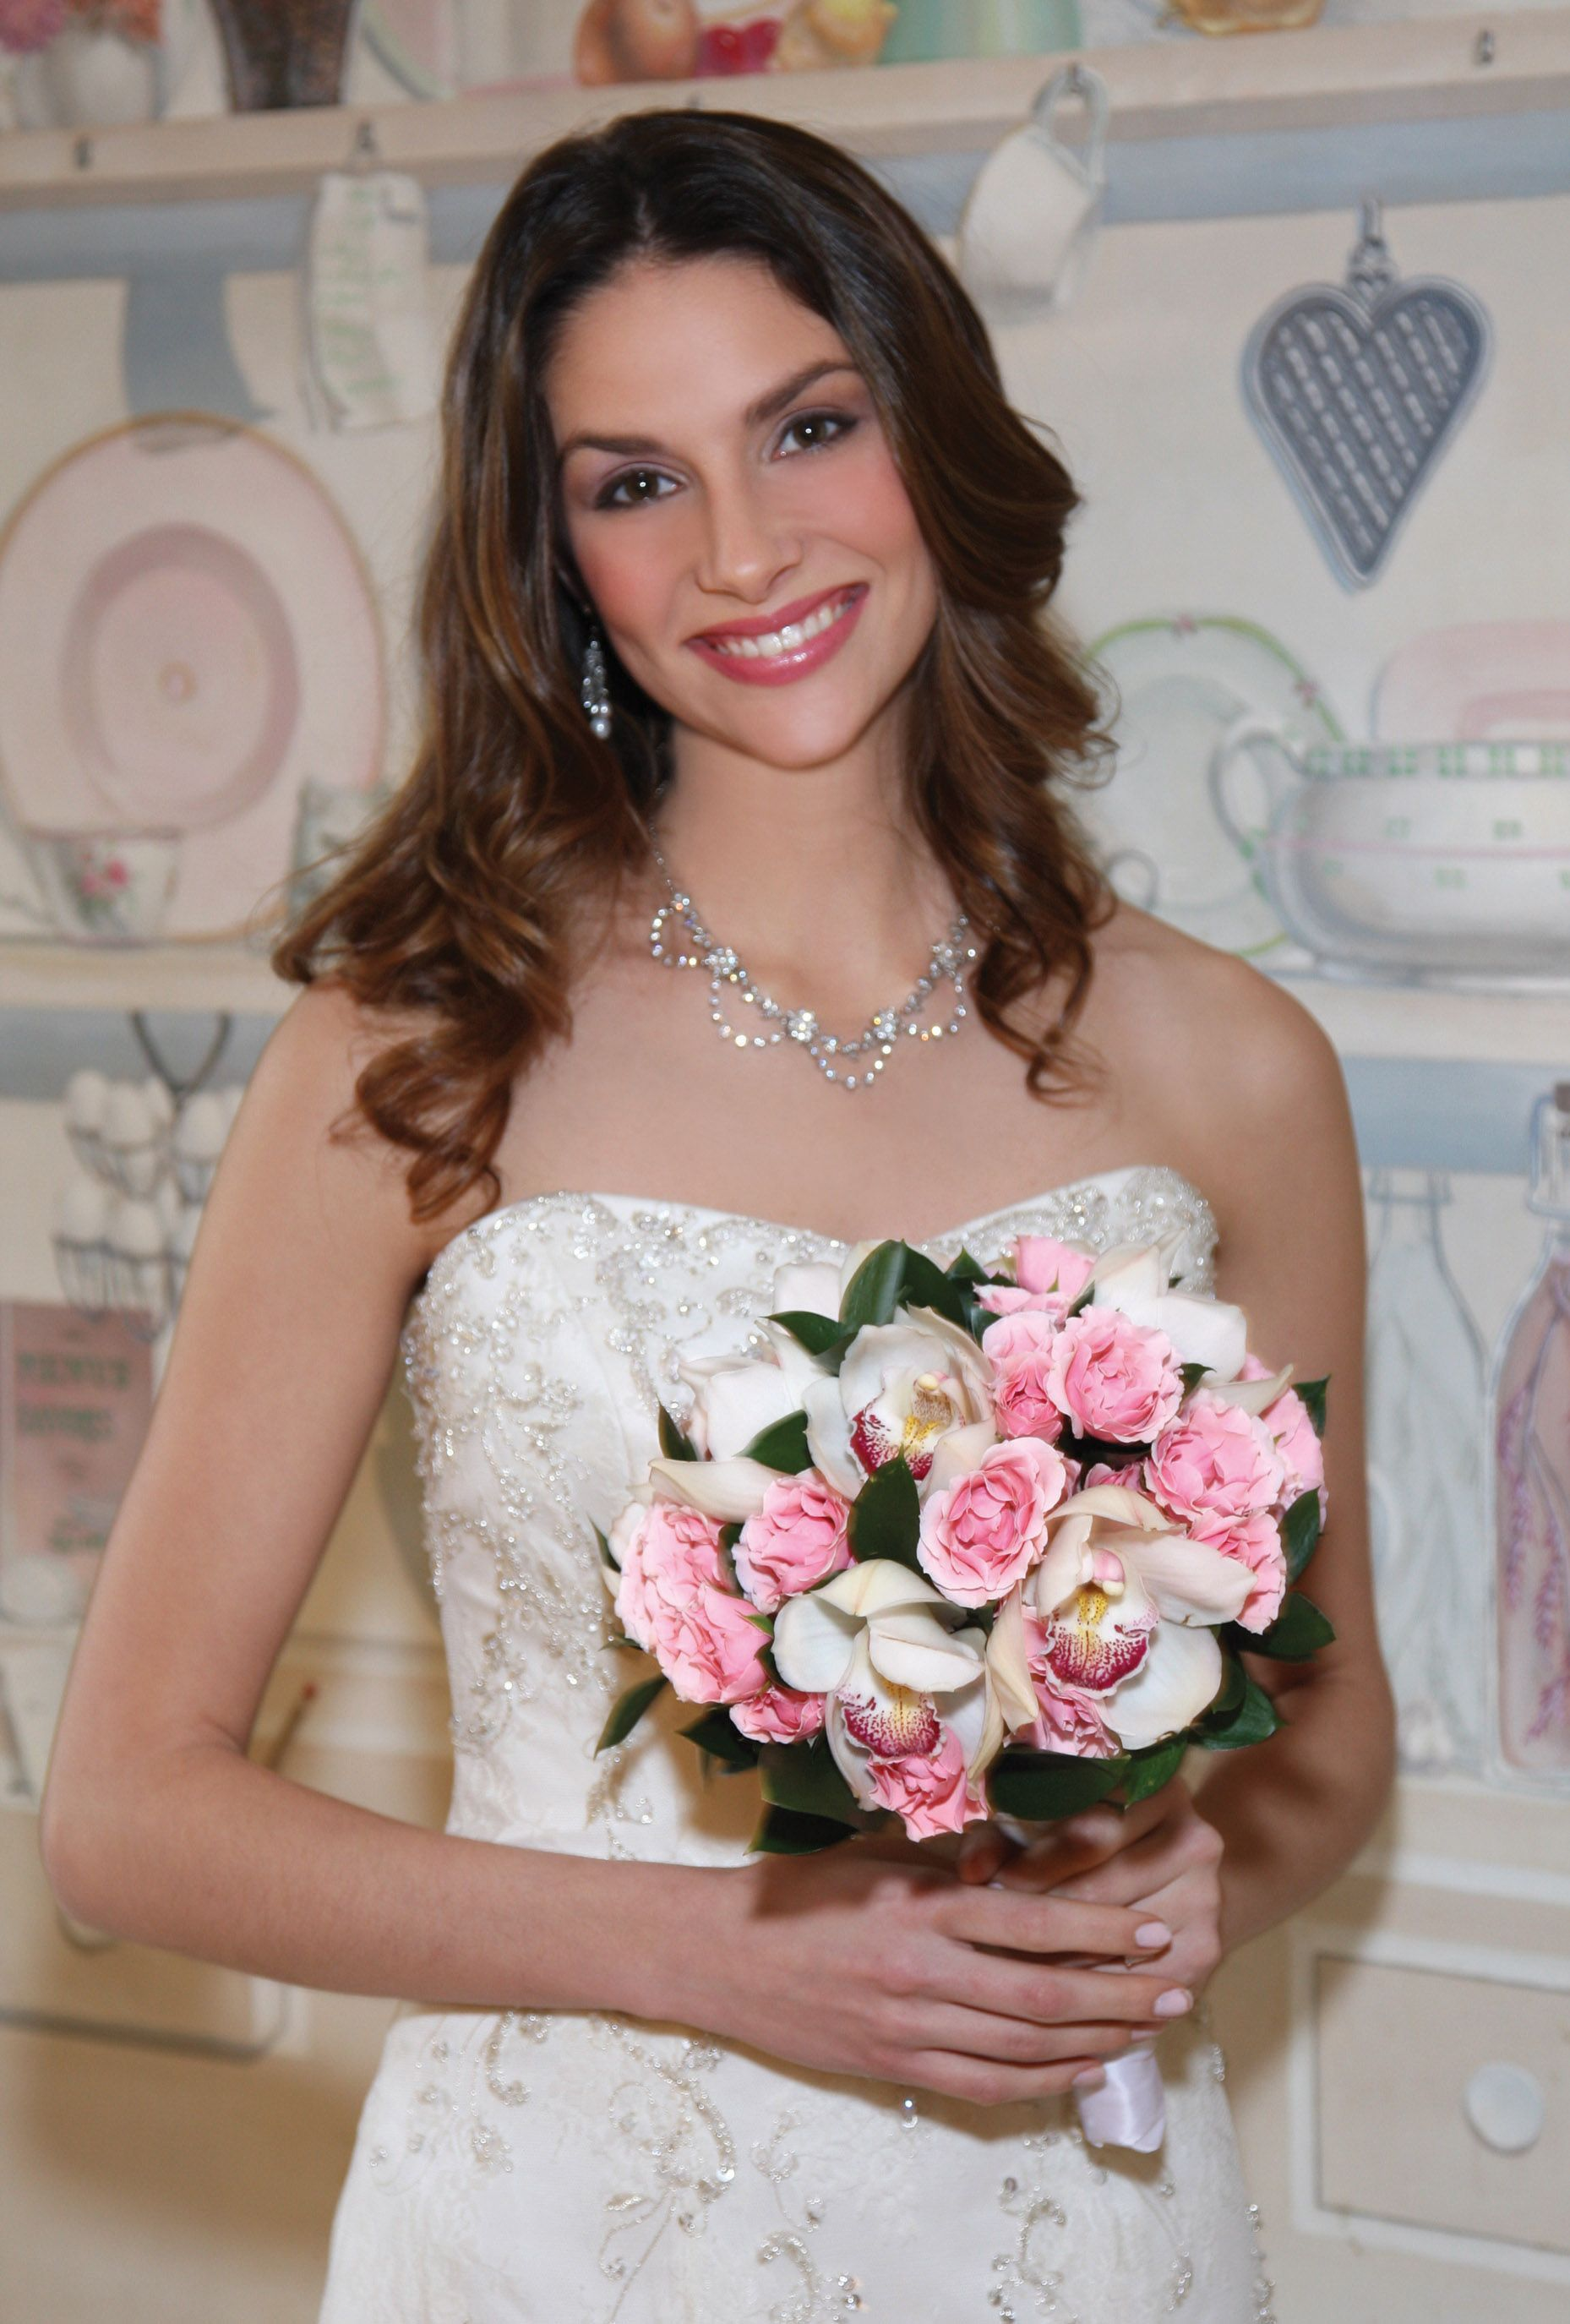 Summer Bridal Makeup look using Airbrush Makeup Bridal